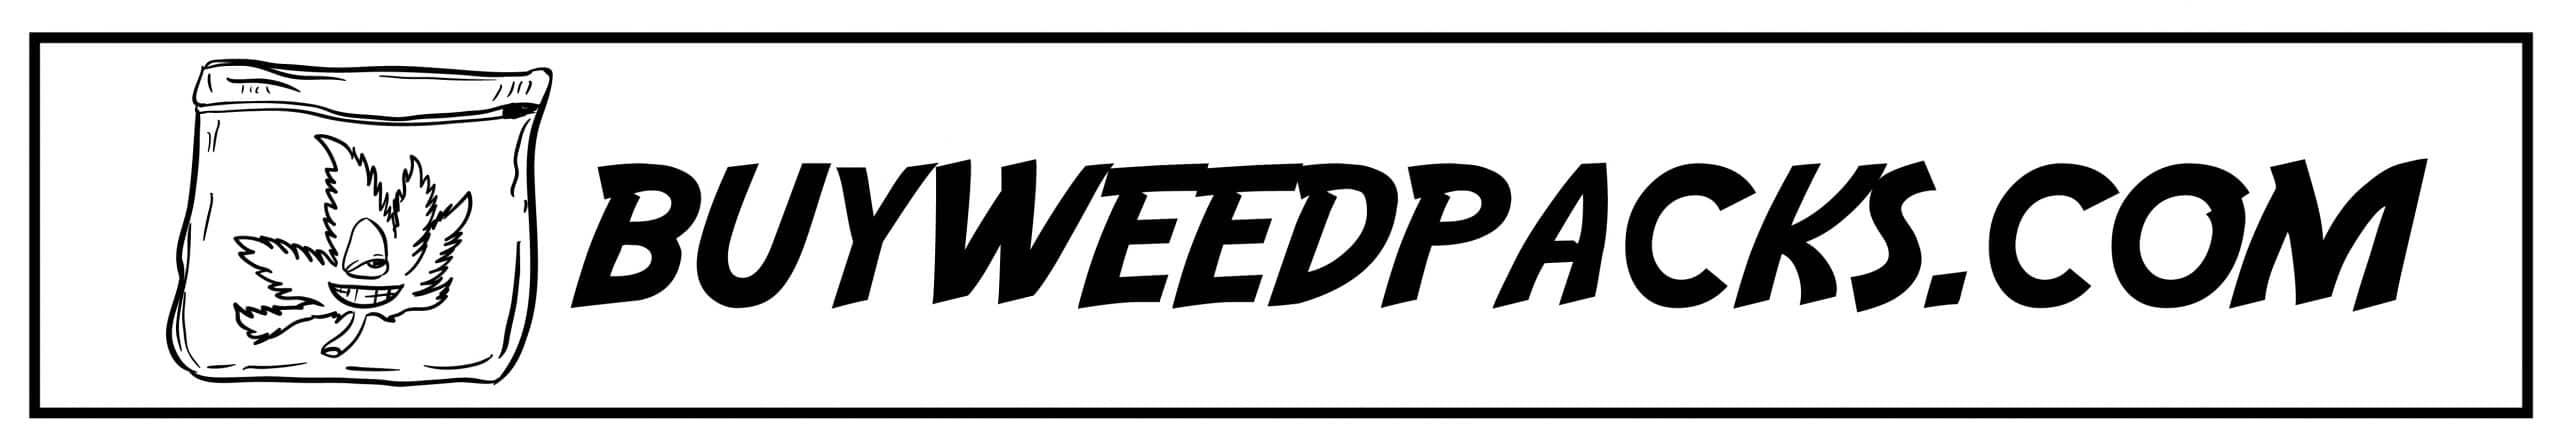 BuyWeedPacks Top Online Cannabis Dispensary Coupon Code